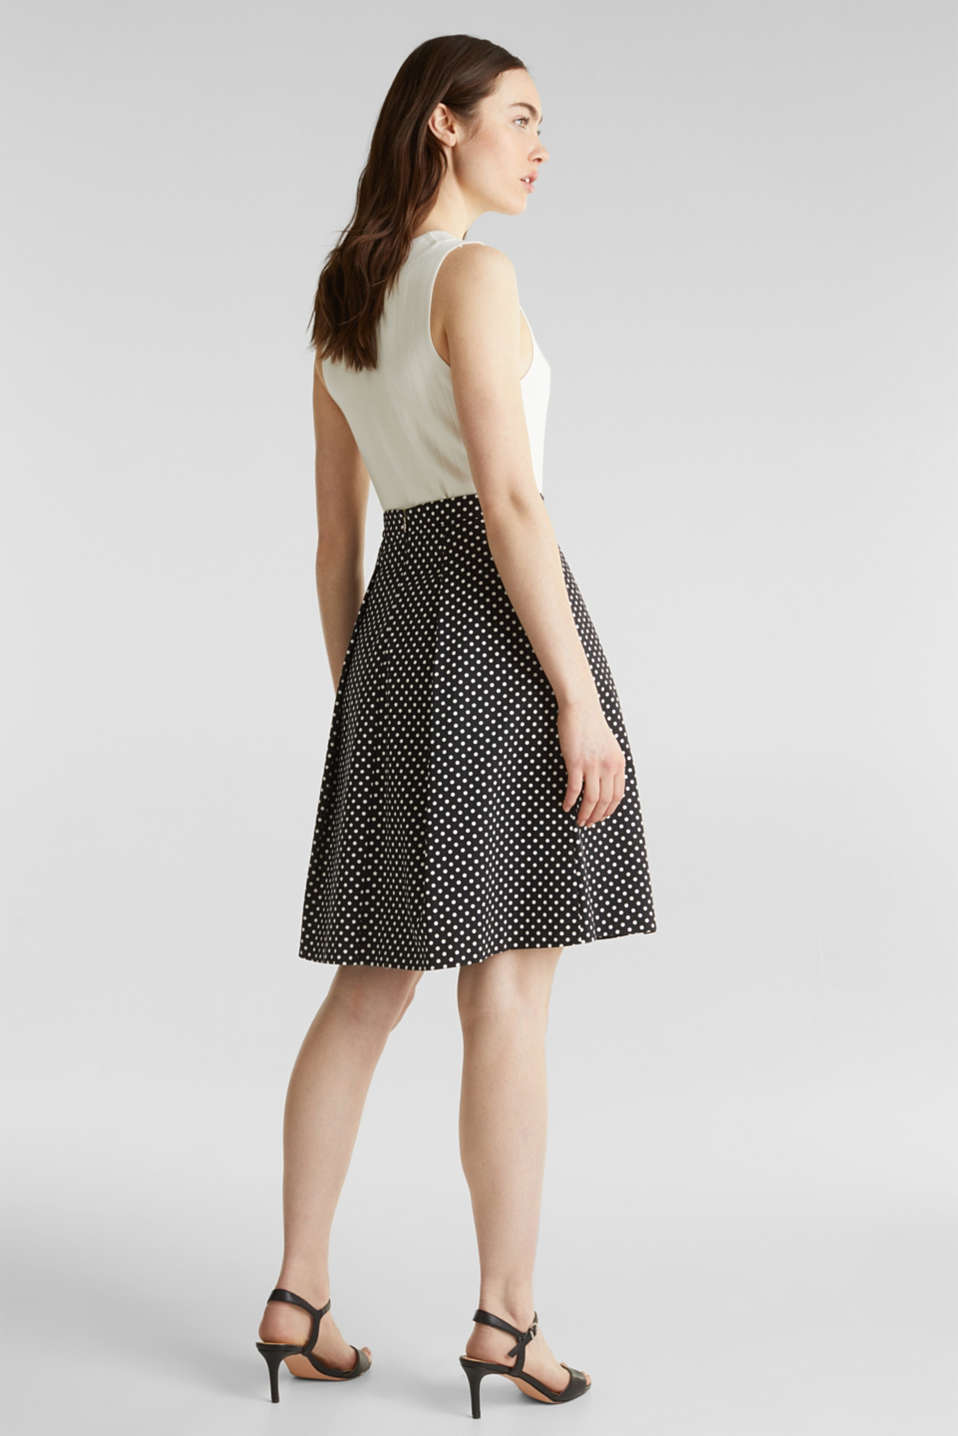 Satined polka dot skirt with stretch, BLACK 3, detail image number 3